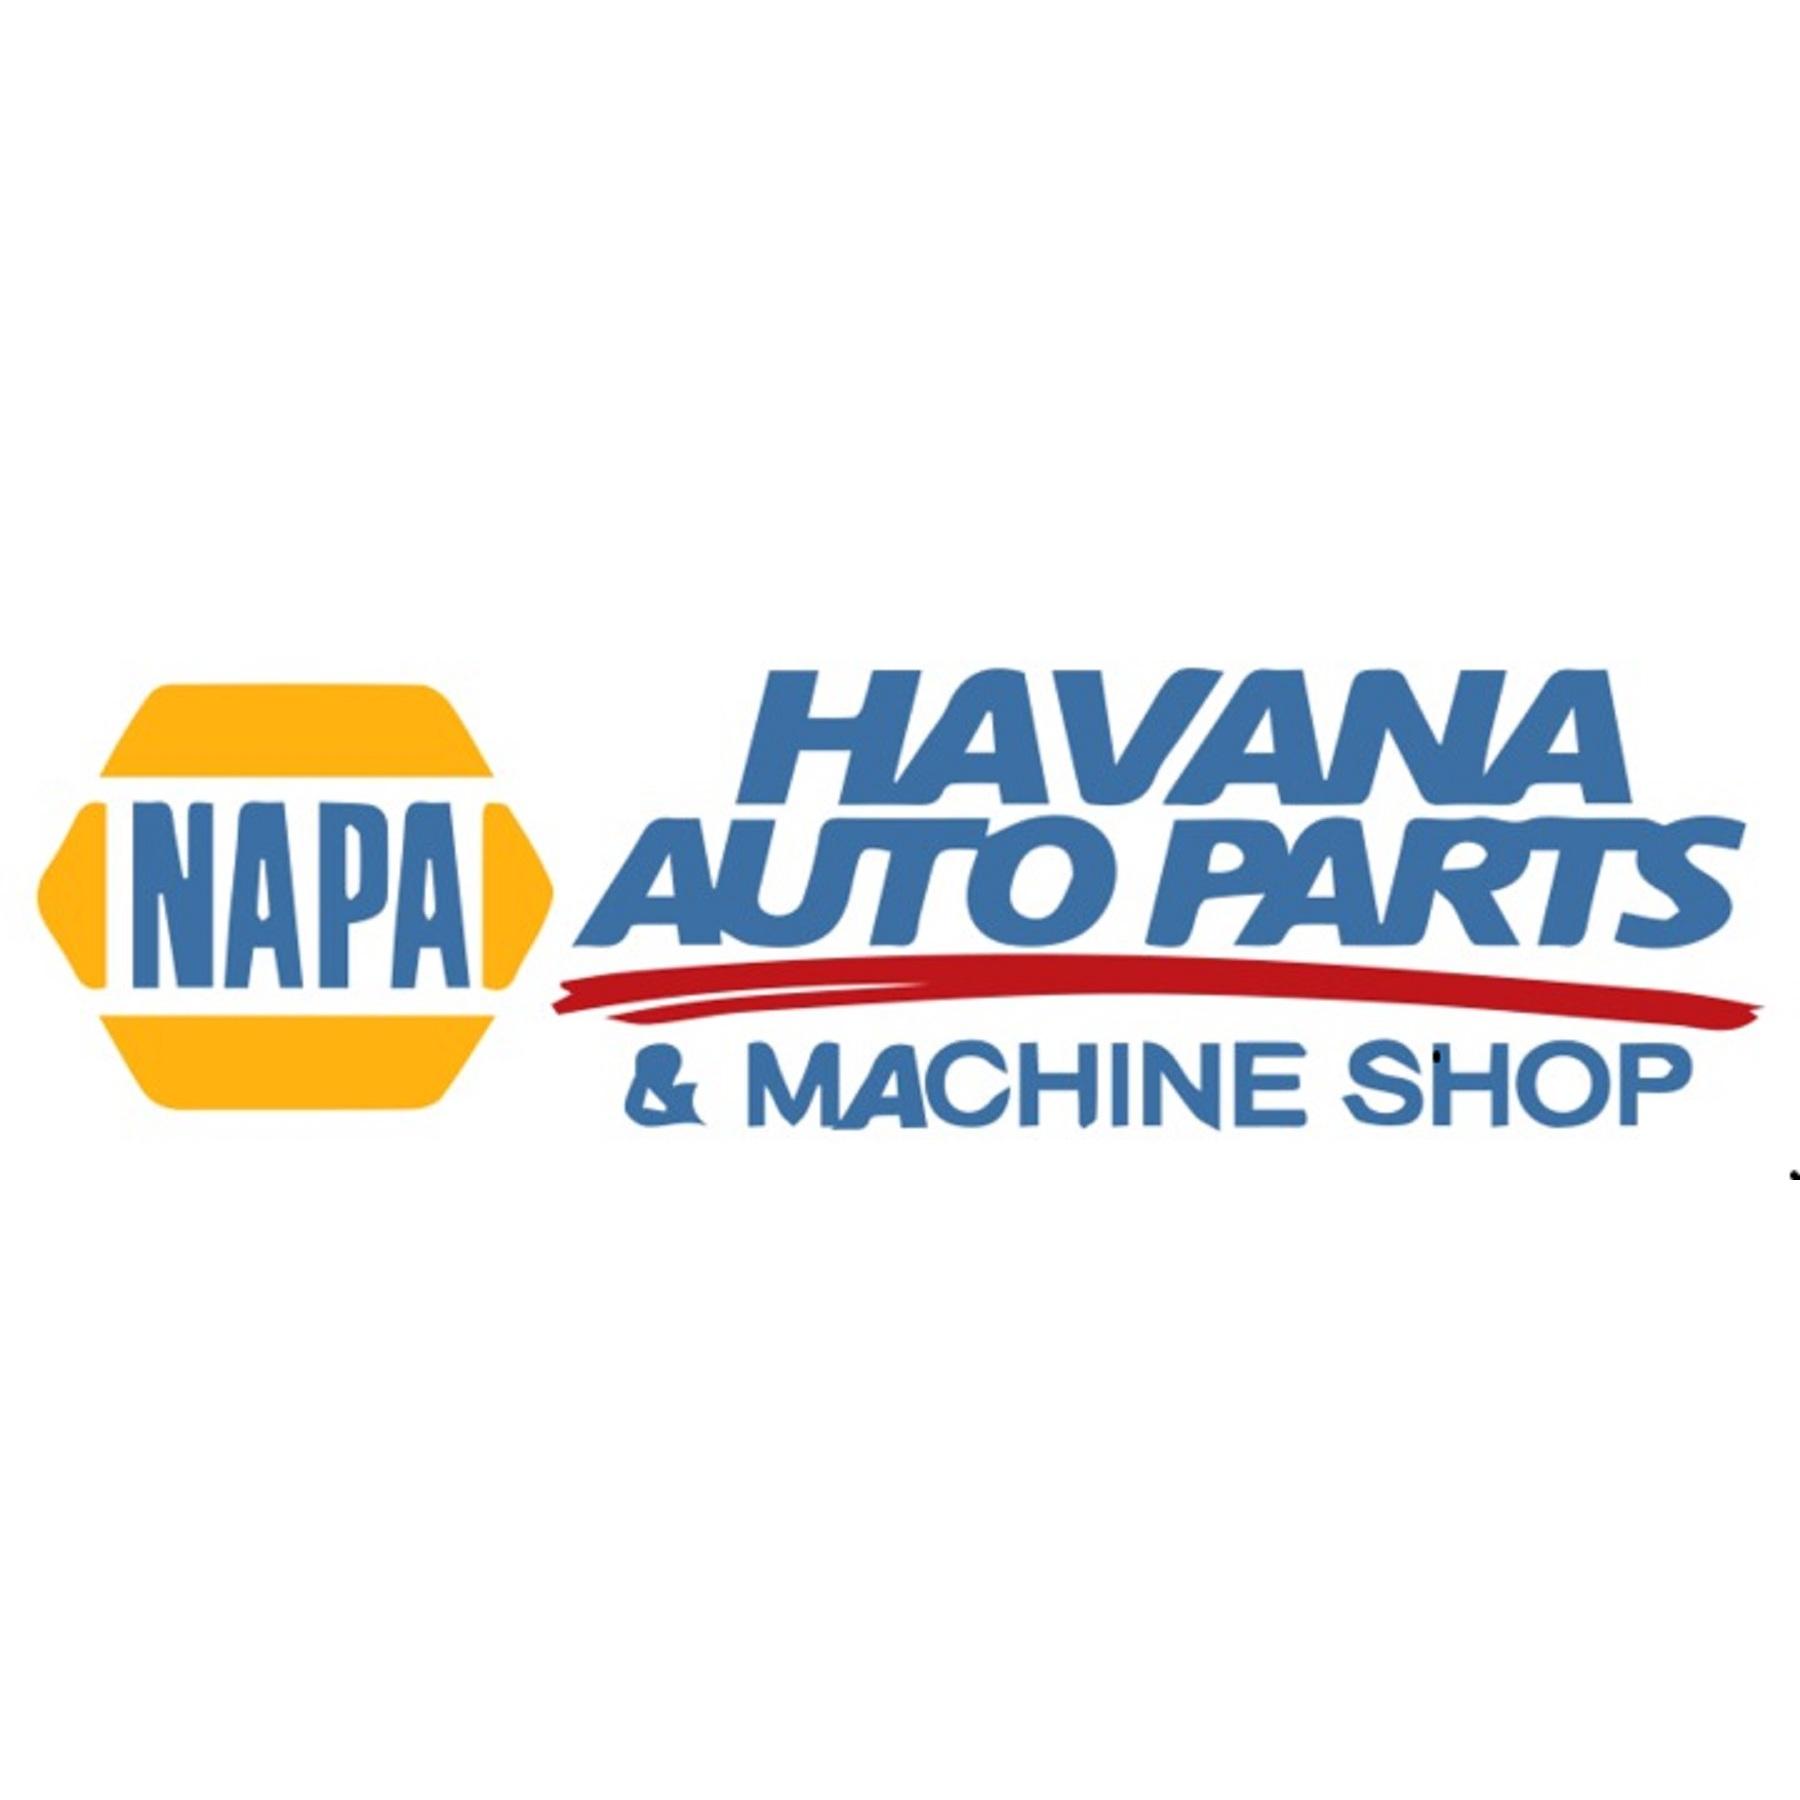 Havana Auto Parts